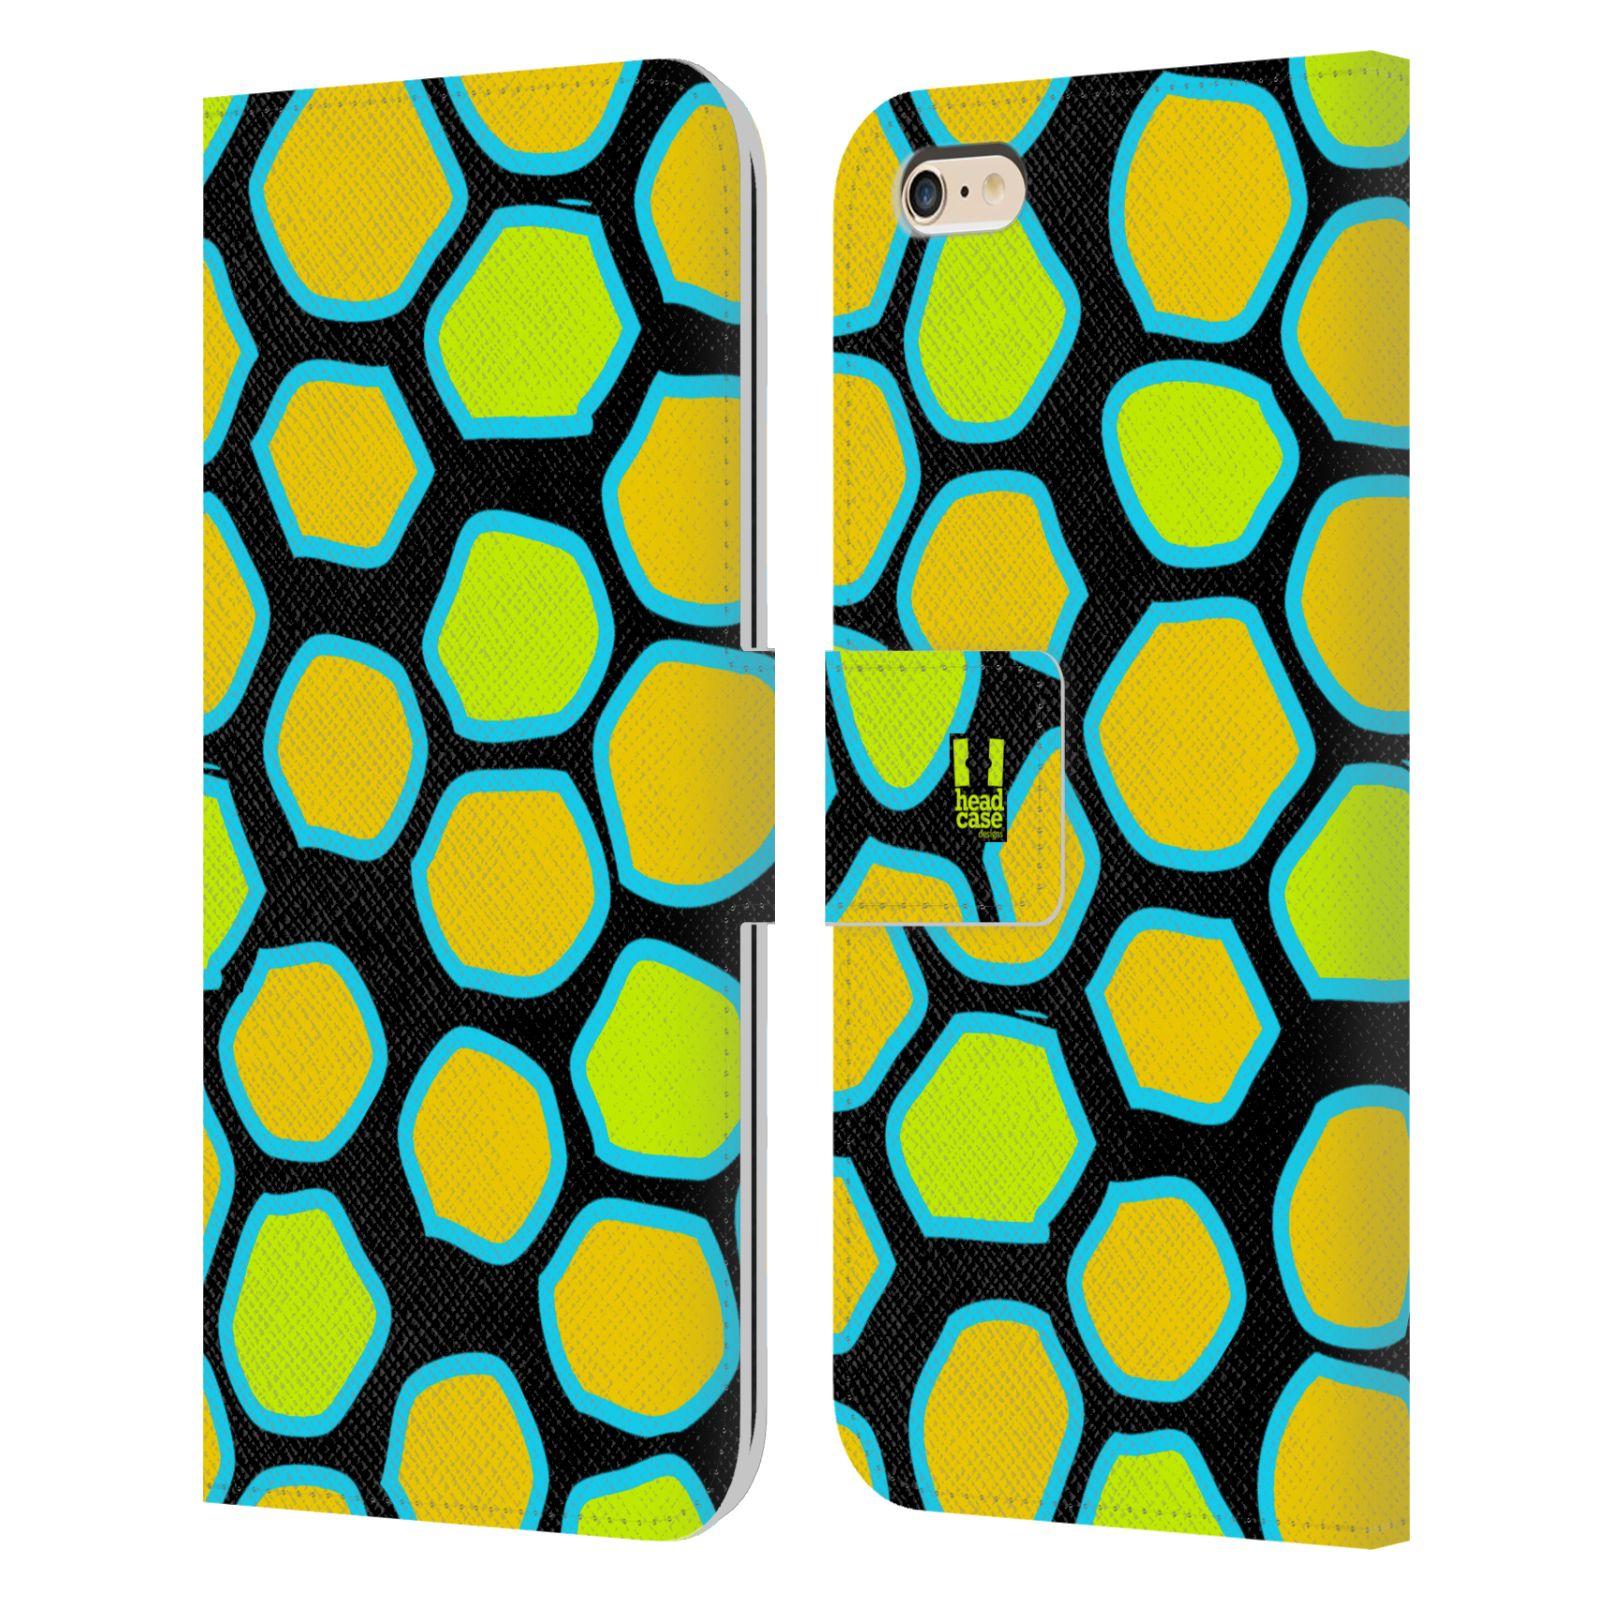 HEAD CASE Flipové pouzdro pro mobil Apple Iphone 6 PLUS / 6S PLUS Zvířecí barevné vzory žlutý had